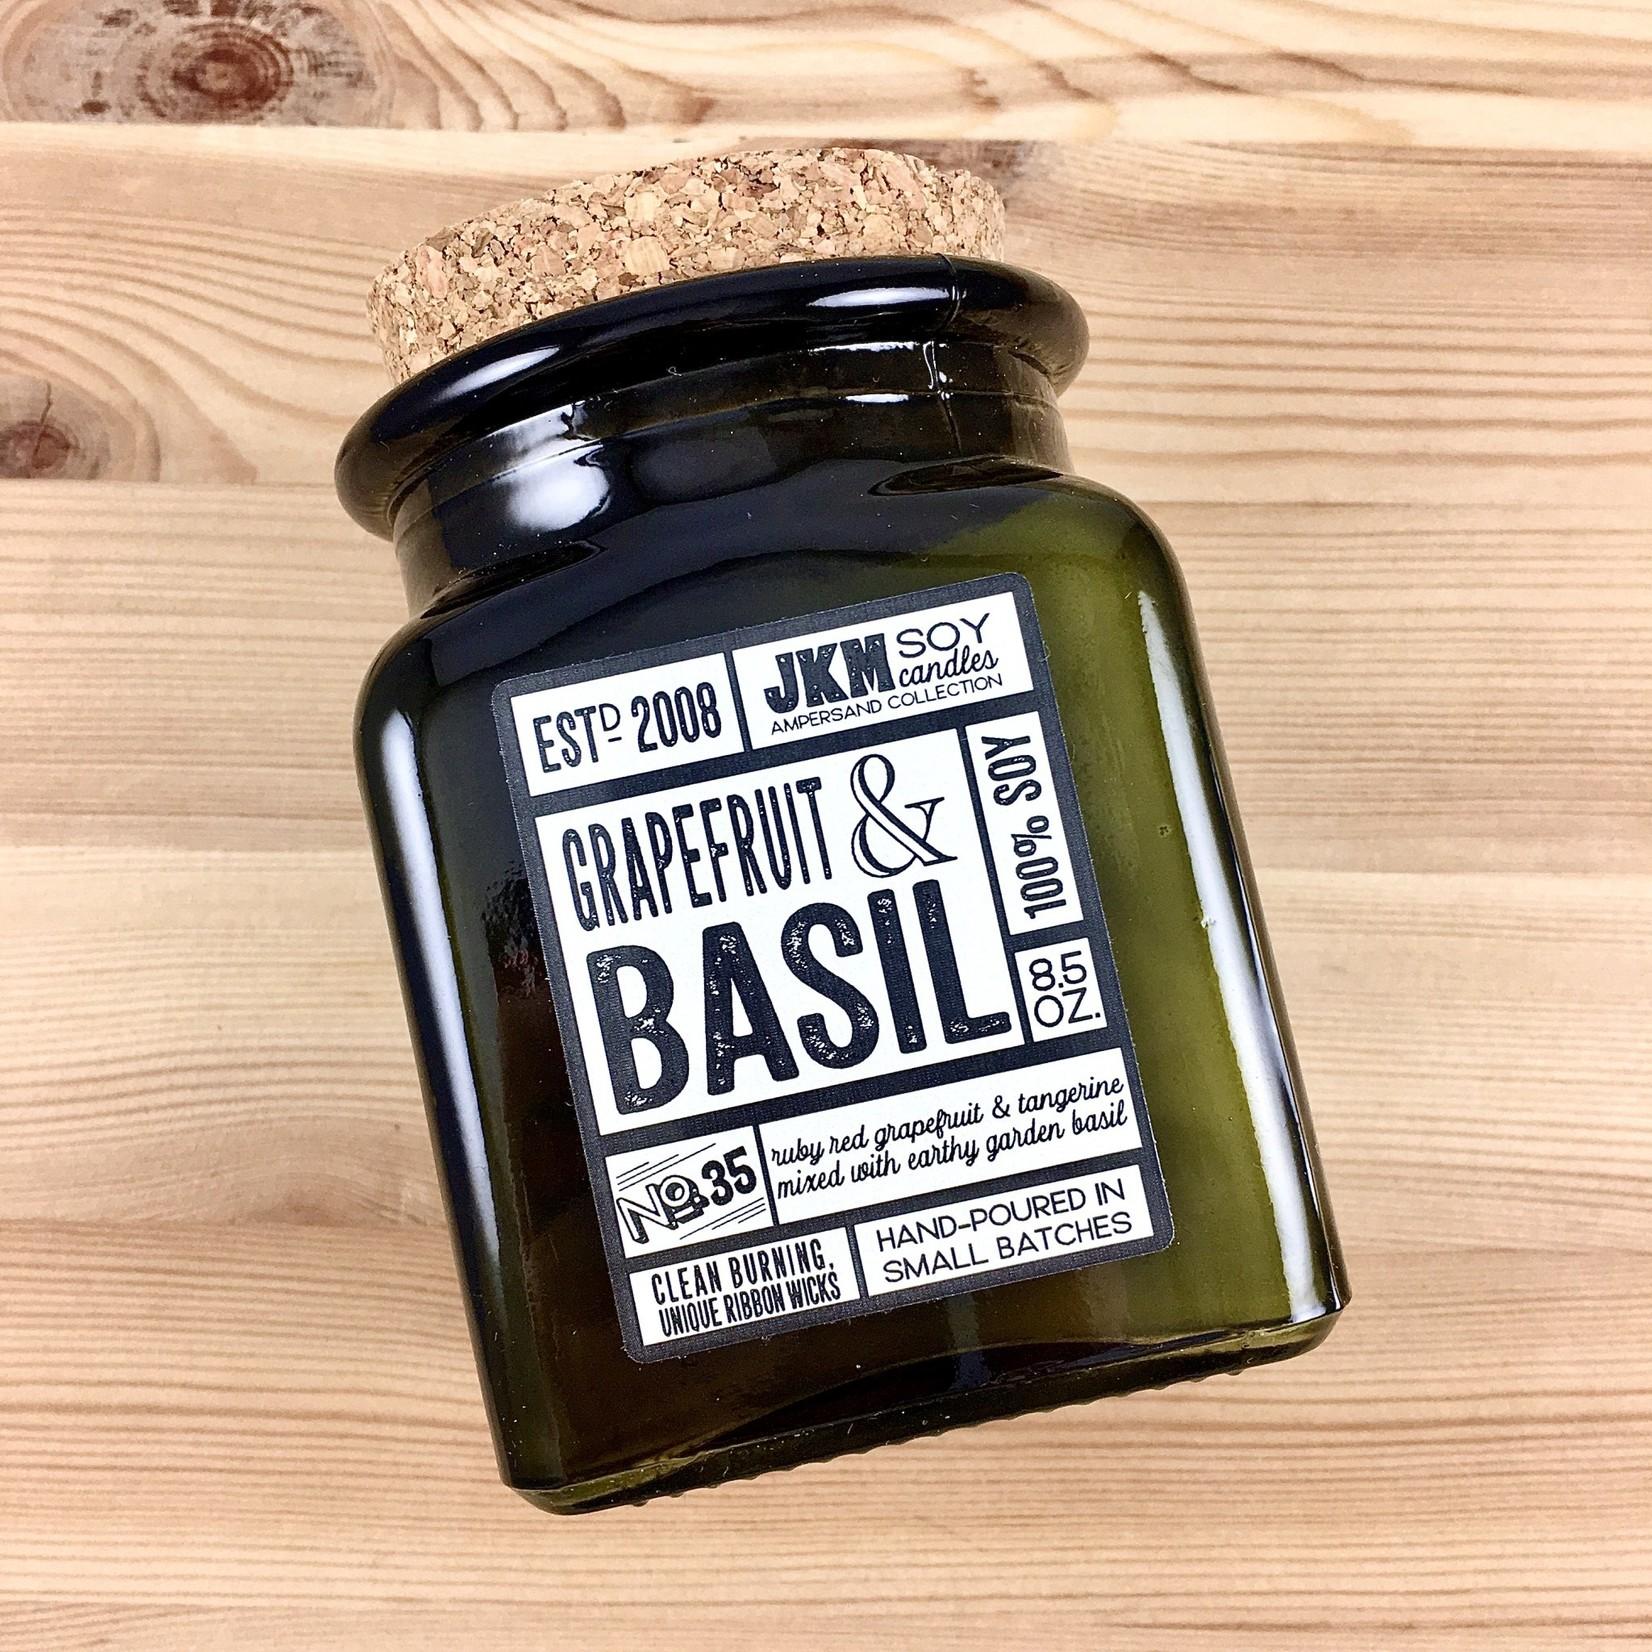 JKM Soy Candles AC: Grapefruit & Basil Soy Candle